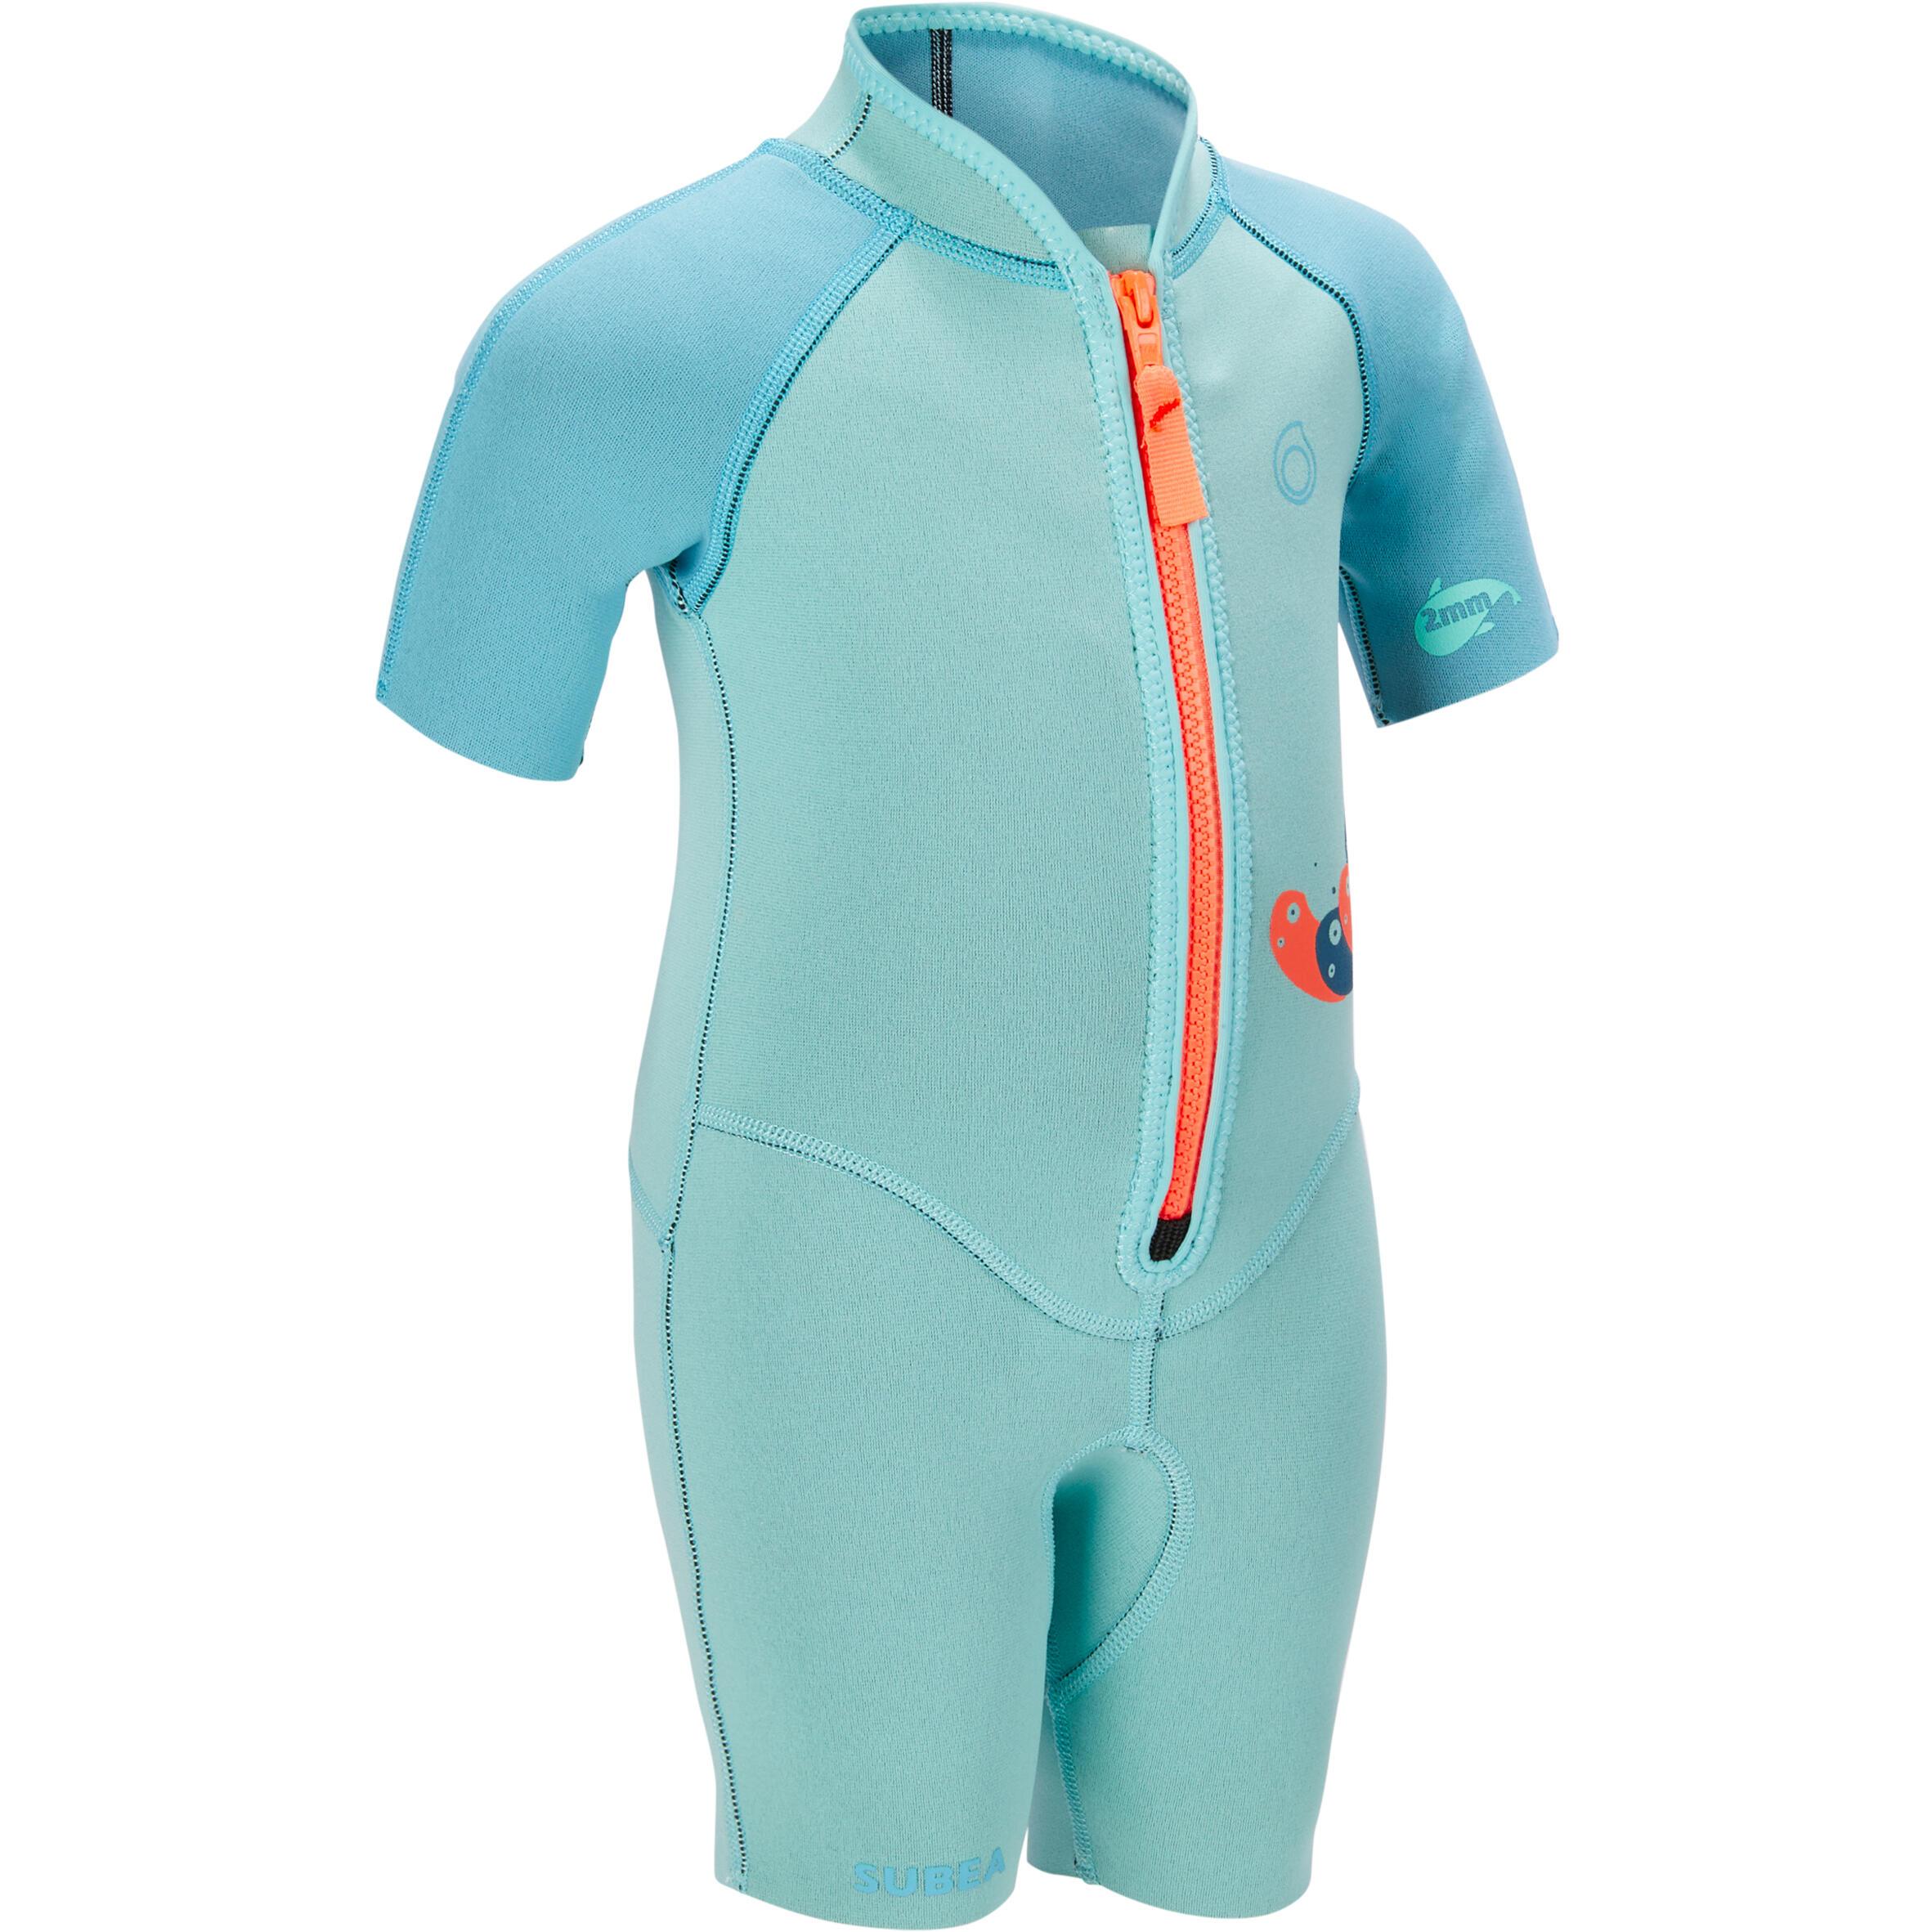 f6faf466184 Comprar Neoprenos Snorkel online | Decathlon